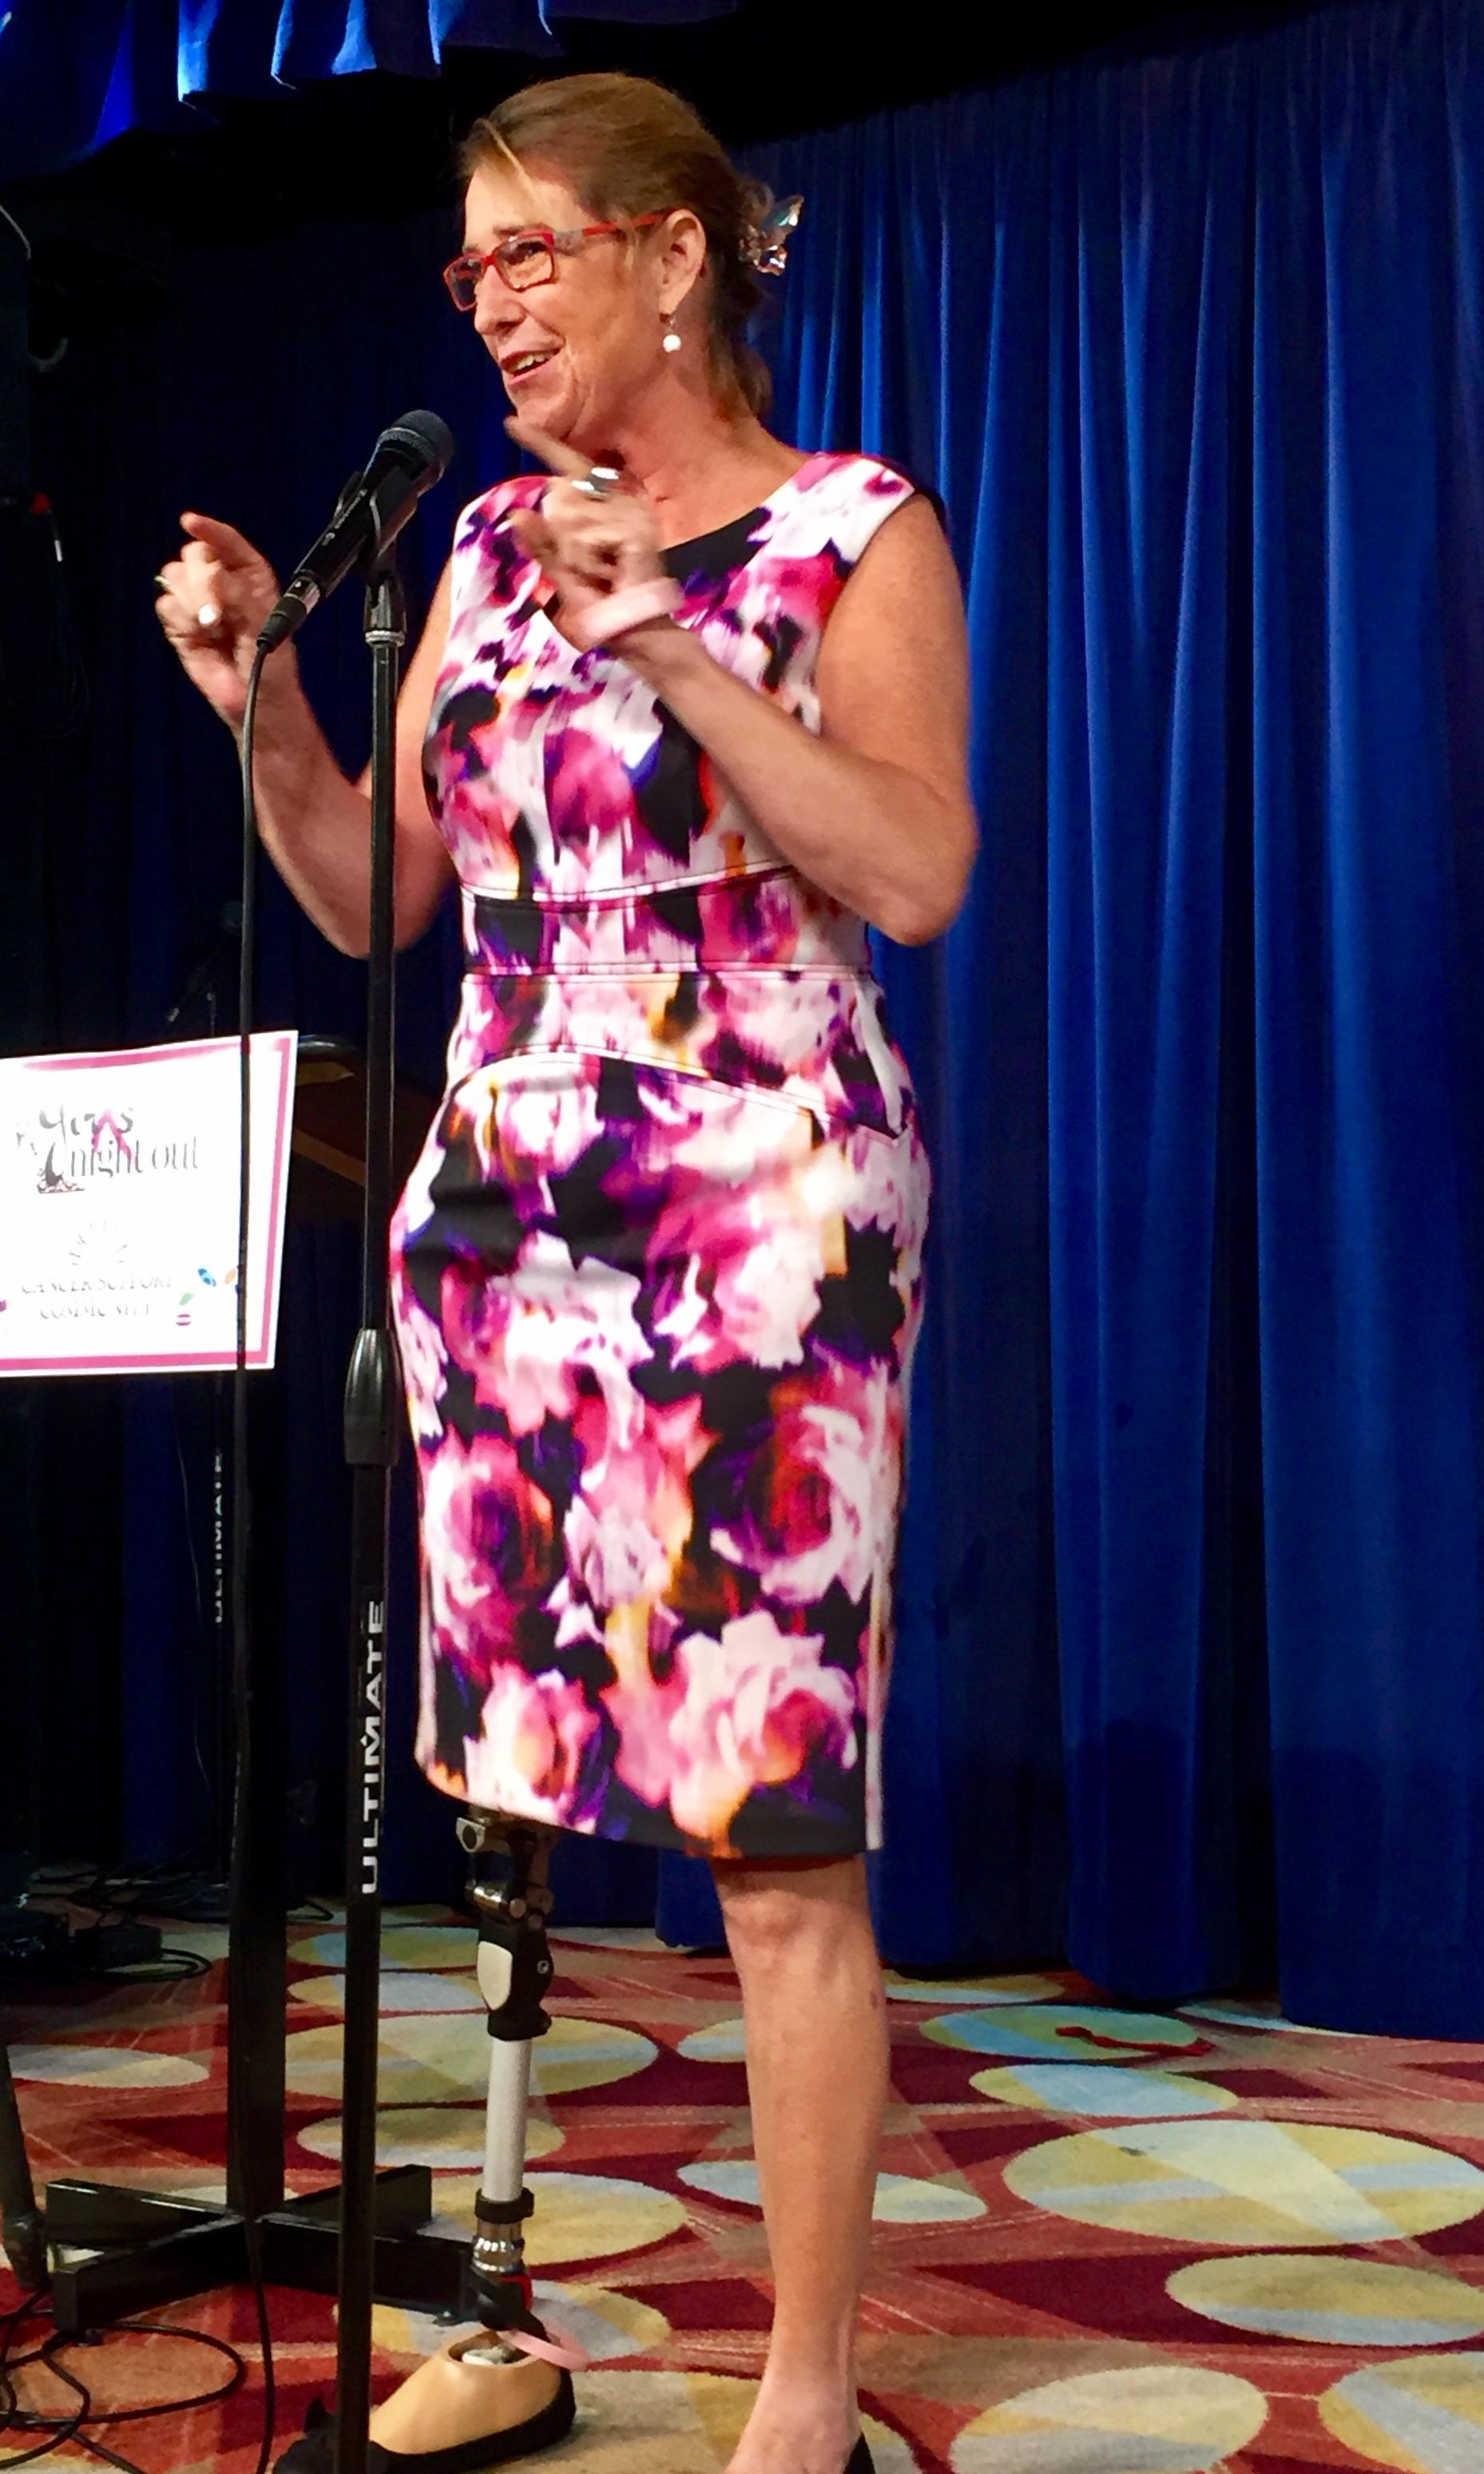 Keynote at Comedy & Magic Club 10/6/16